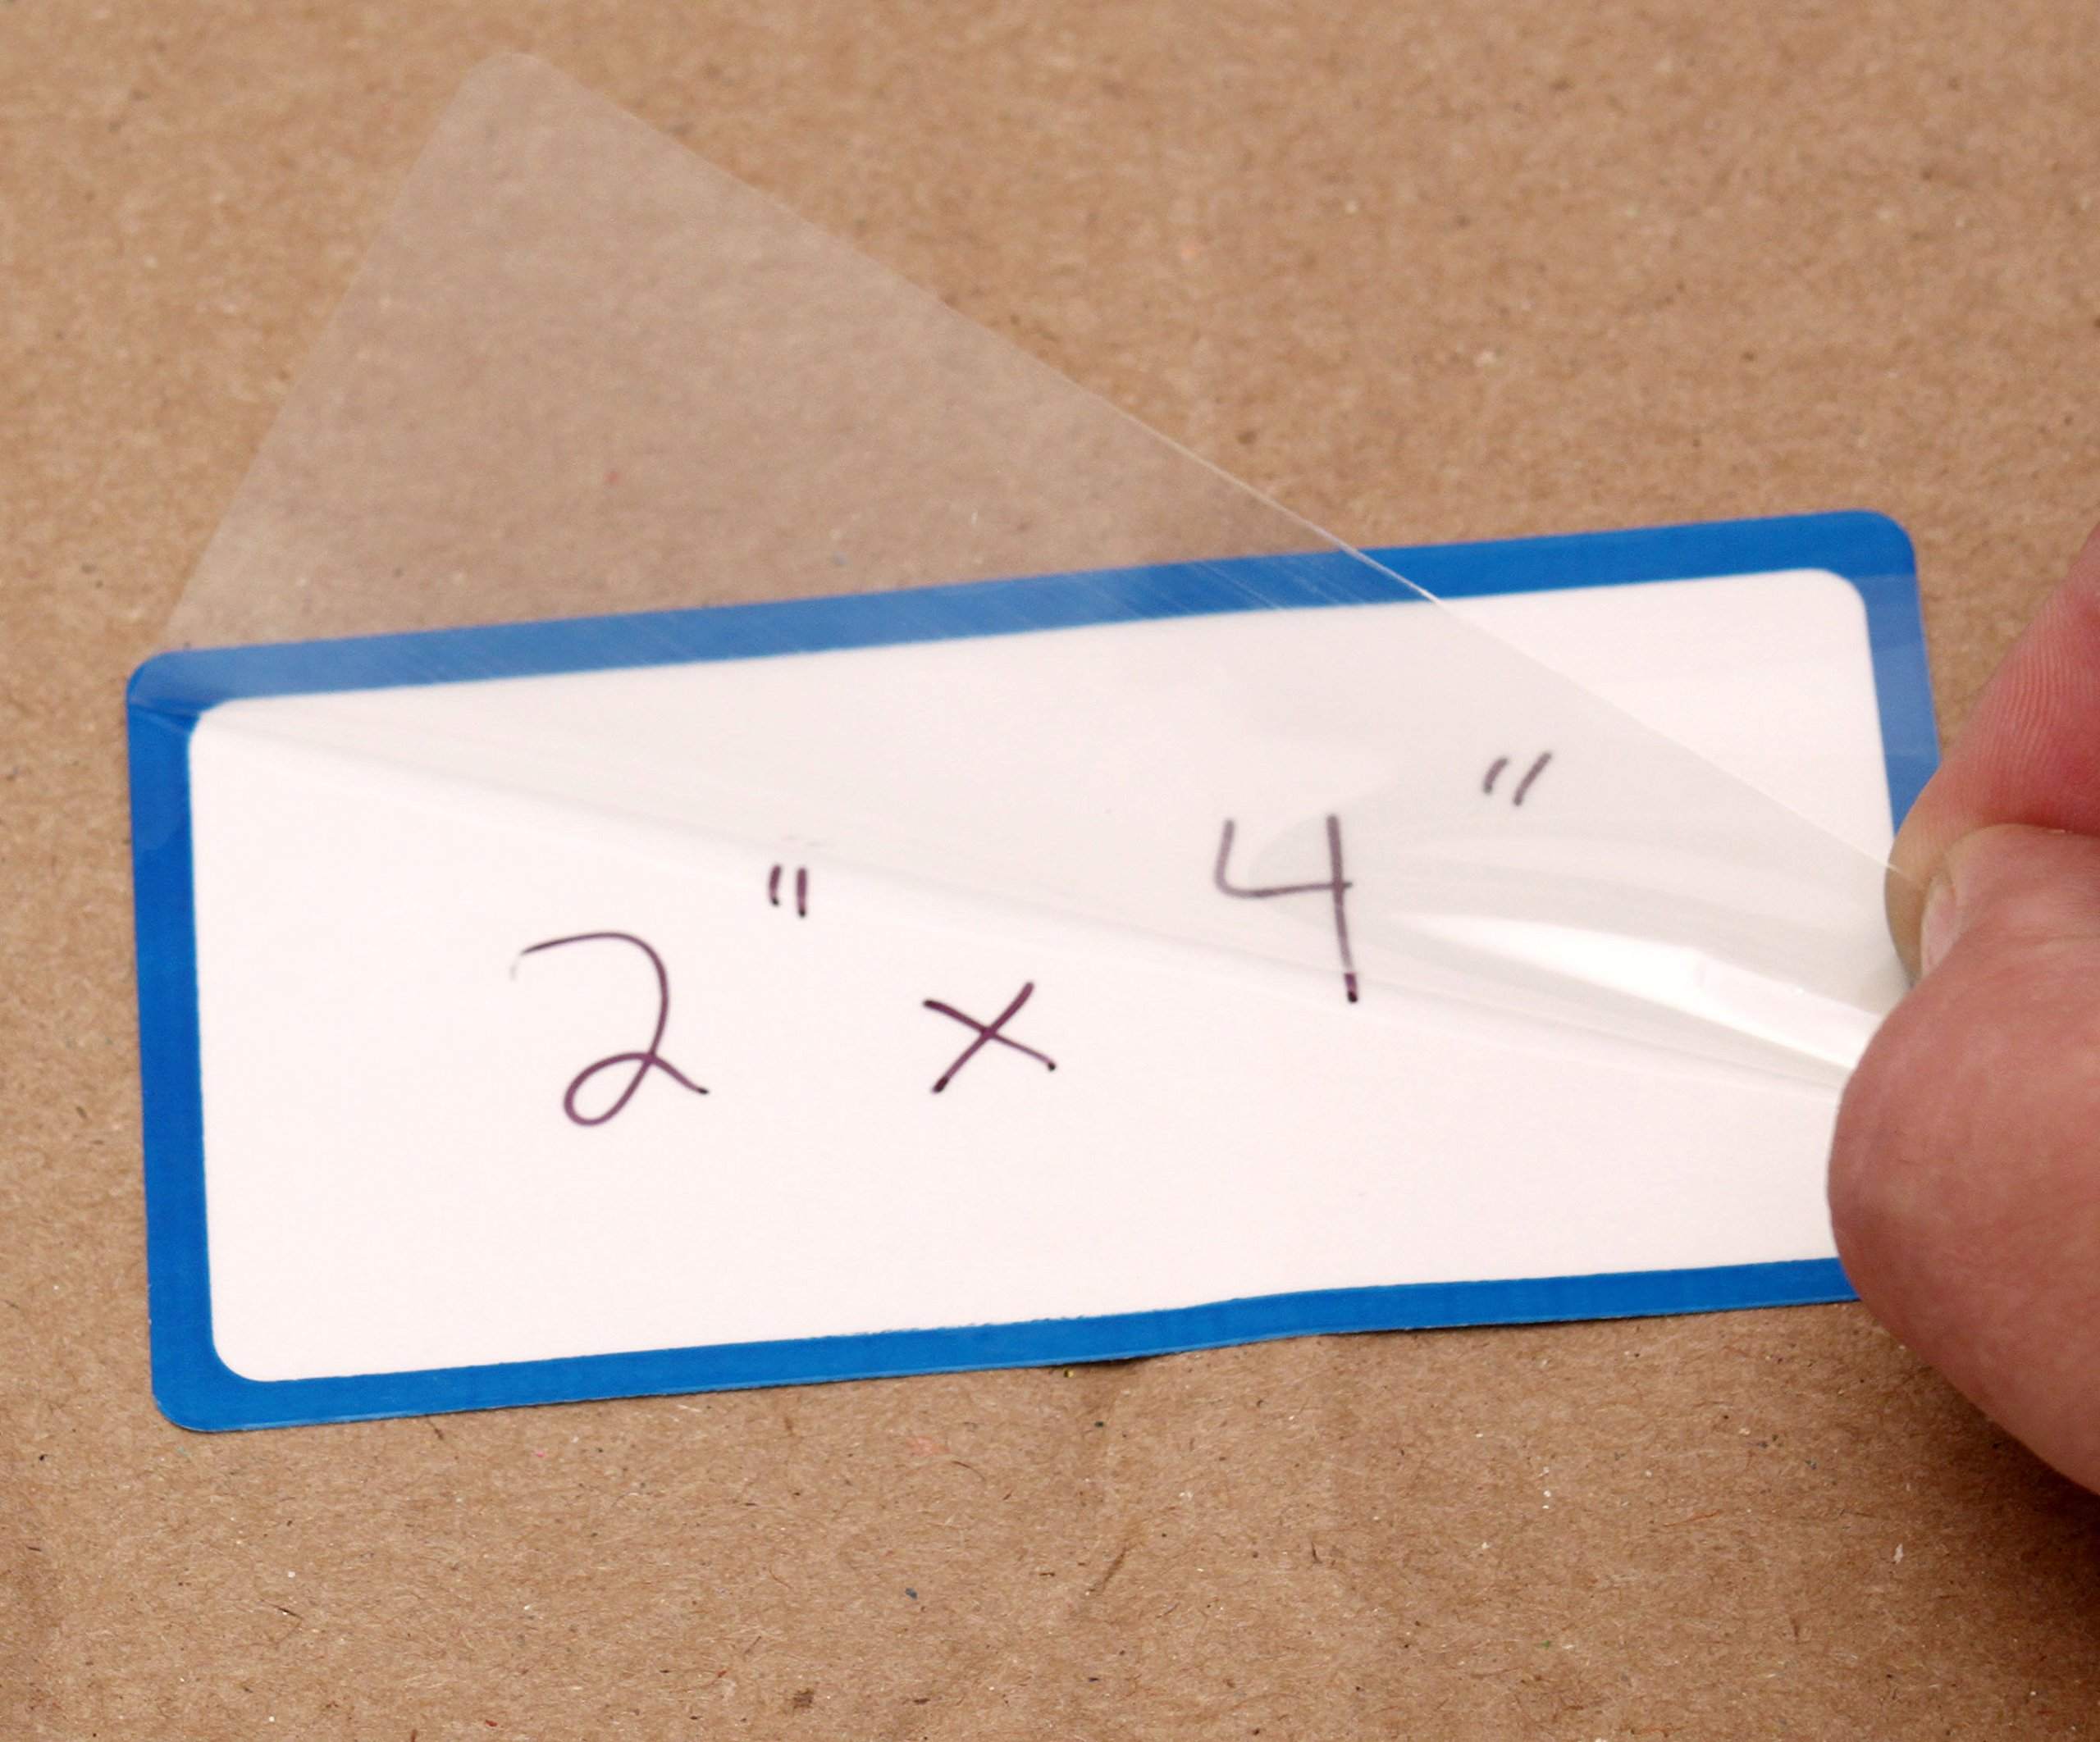 ChromaLabel 2 x 4 inch Dry Erase Labels | 50/Box (Blue Border)